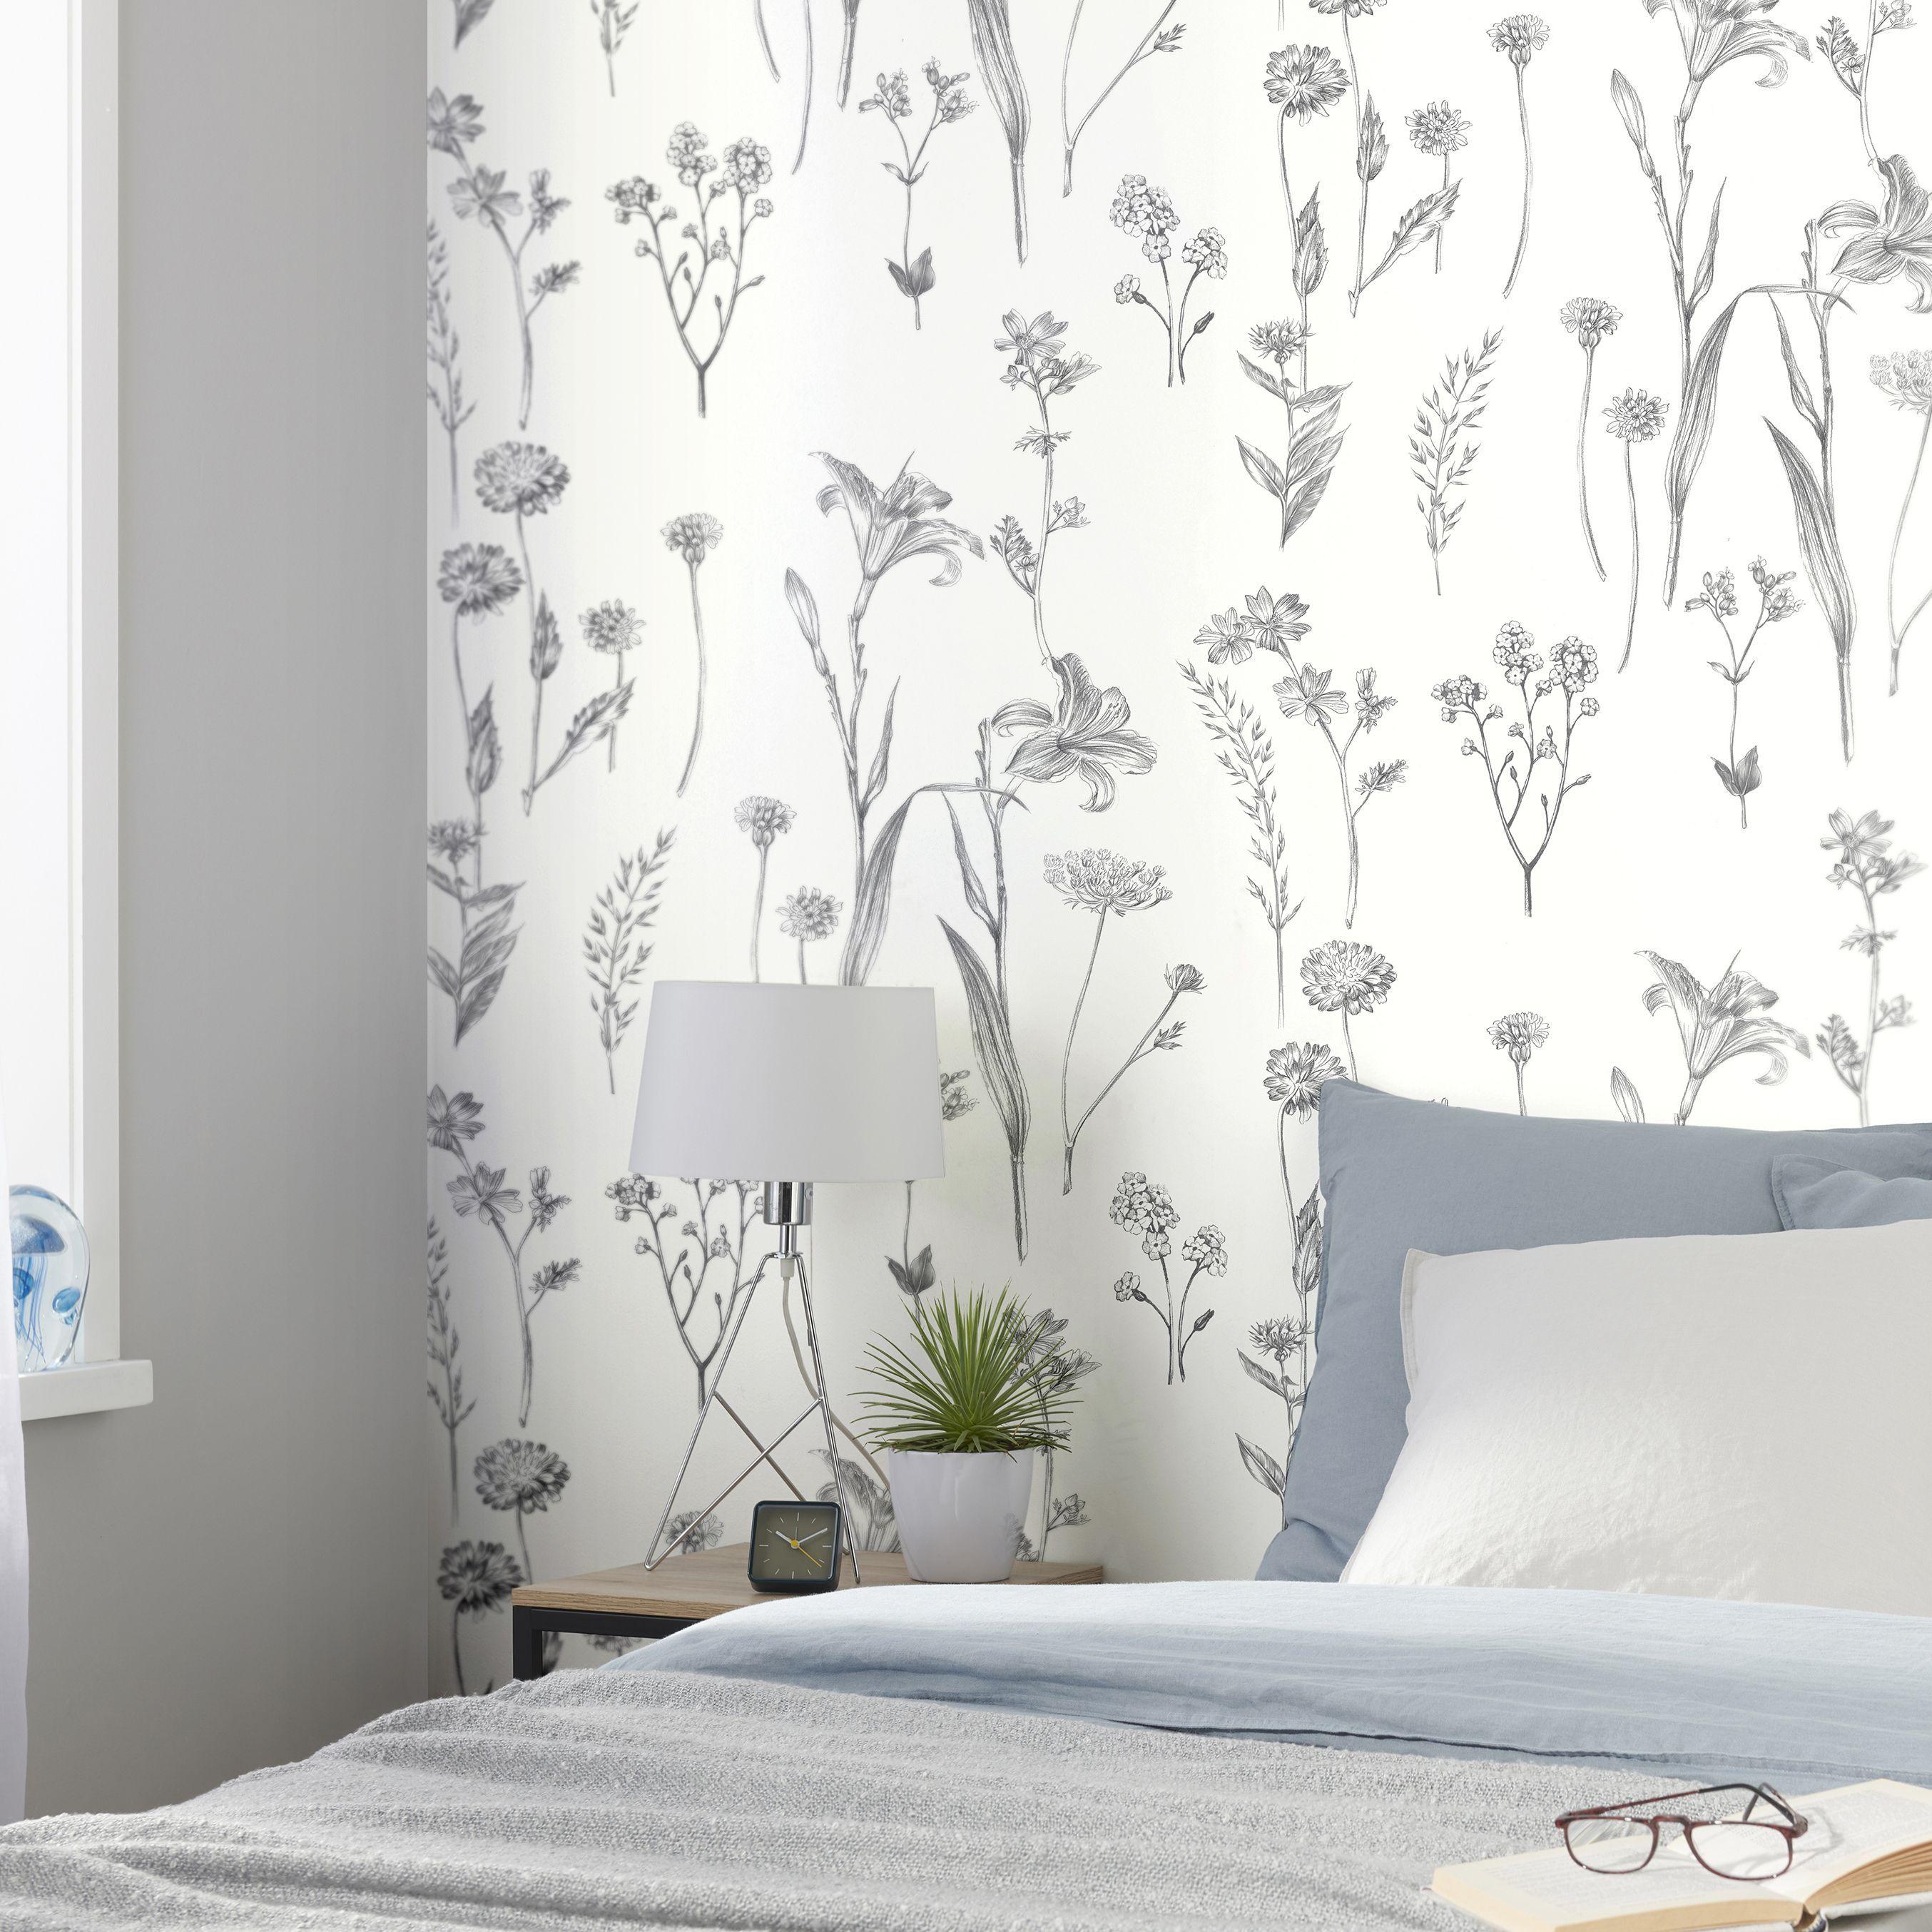 Goodhome Conyza Grey White Floral Wallpapermulticolour Goodhome Textured Wallpaper Home Wallpaper